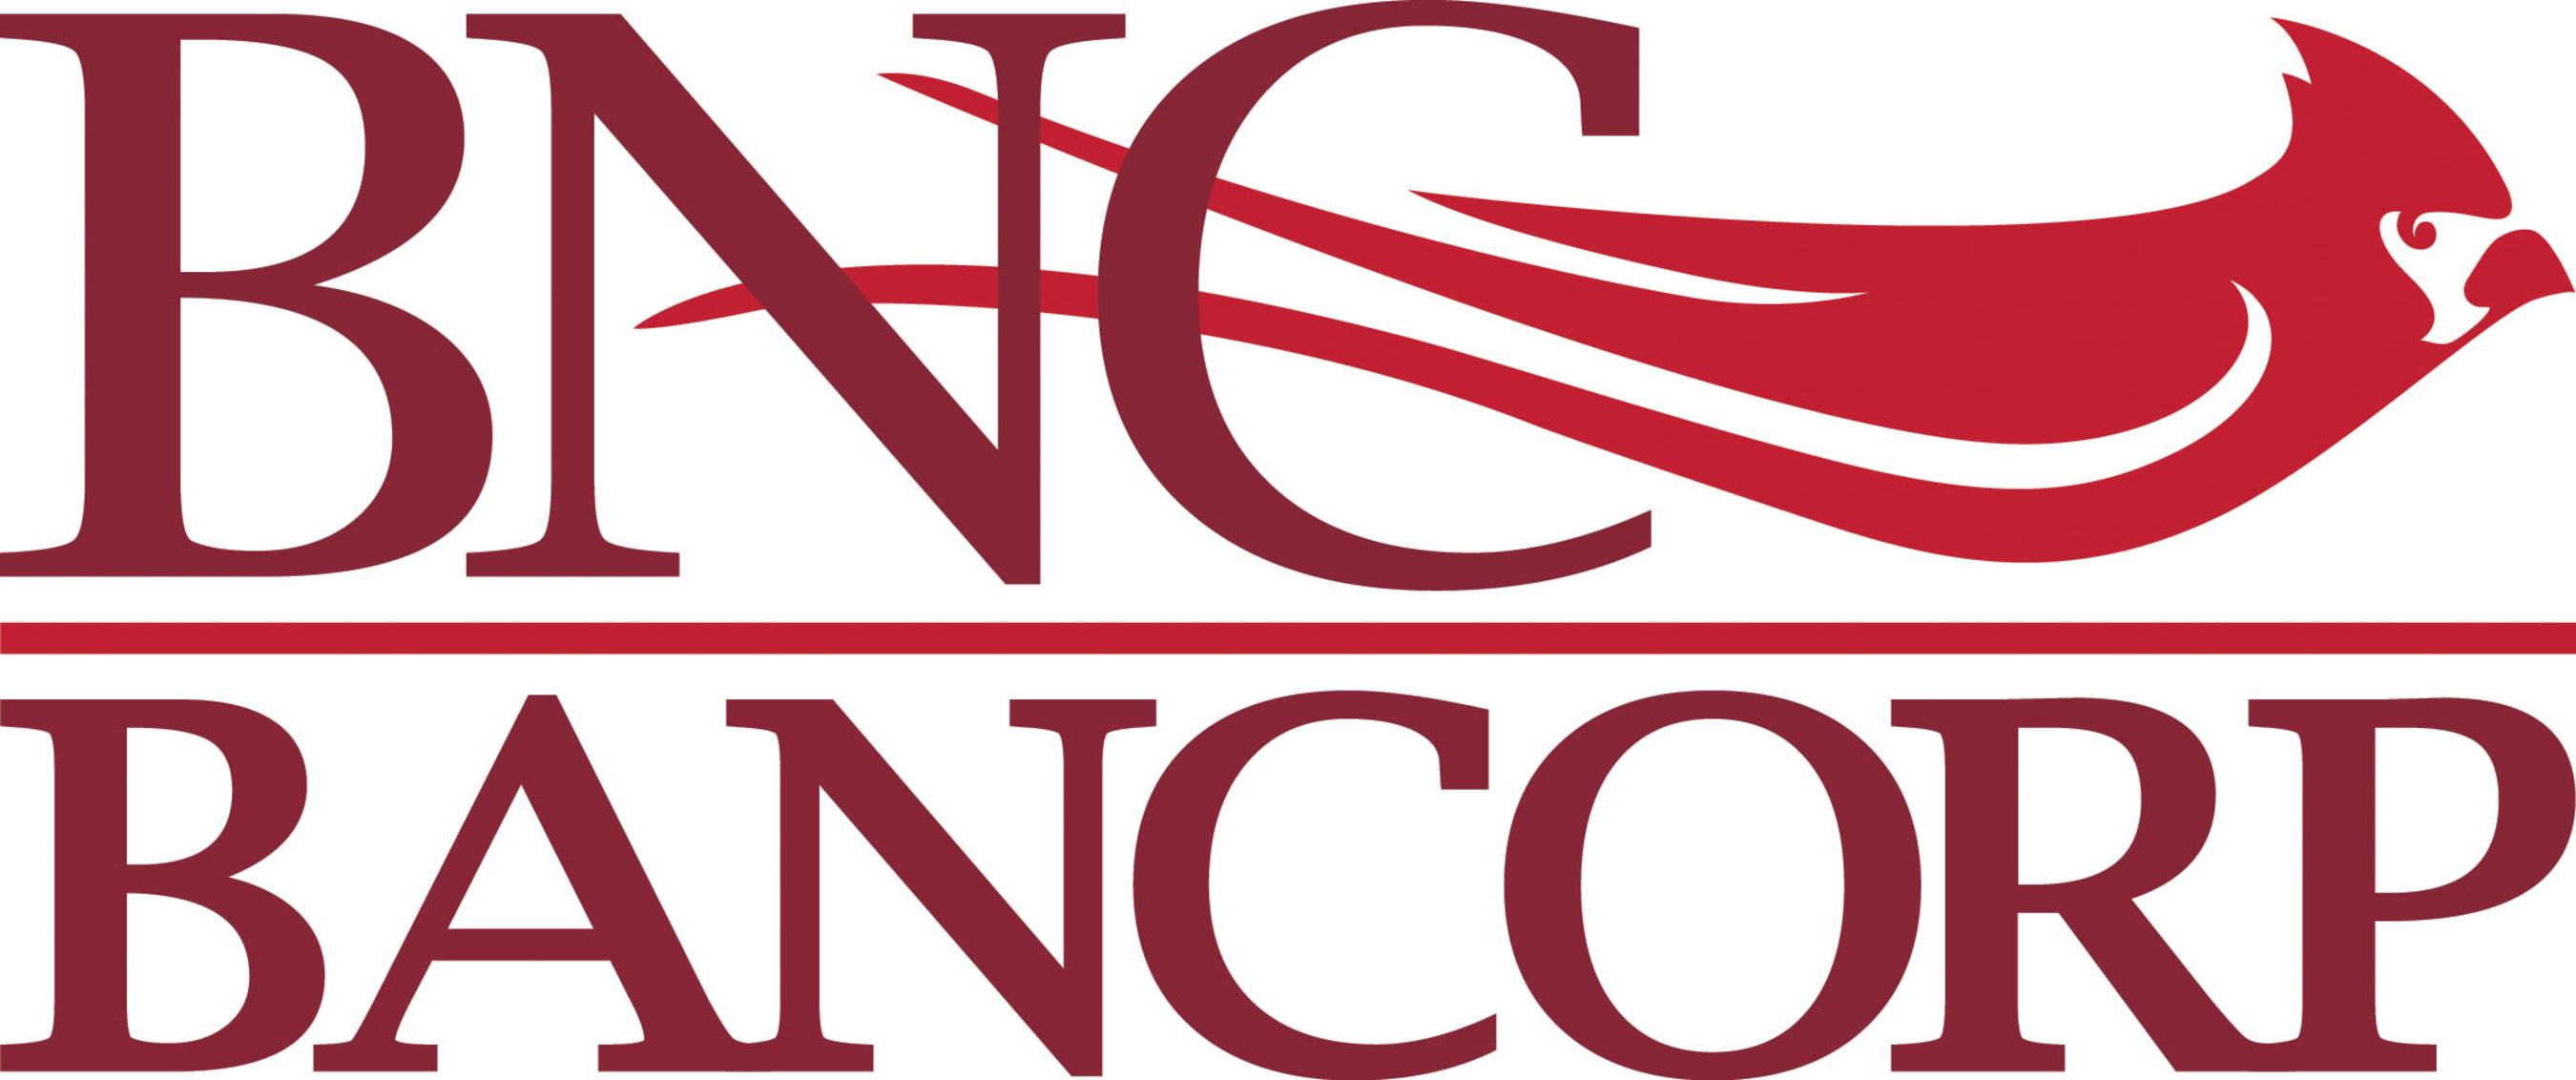 BNC Bancorp logo. BNC Bancorp is a one-bank holding company for Bank of North Carolina.